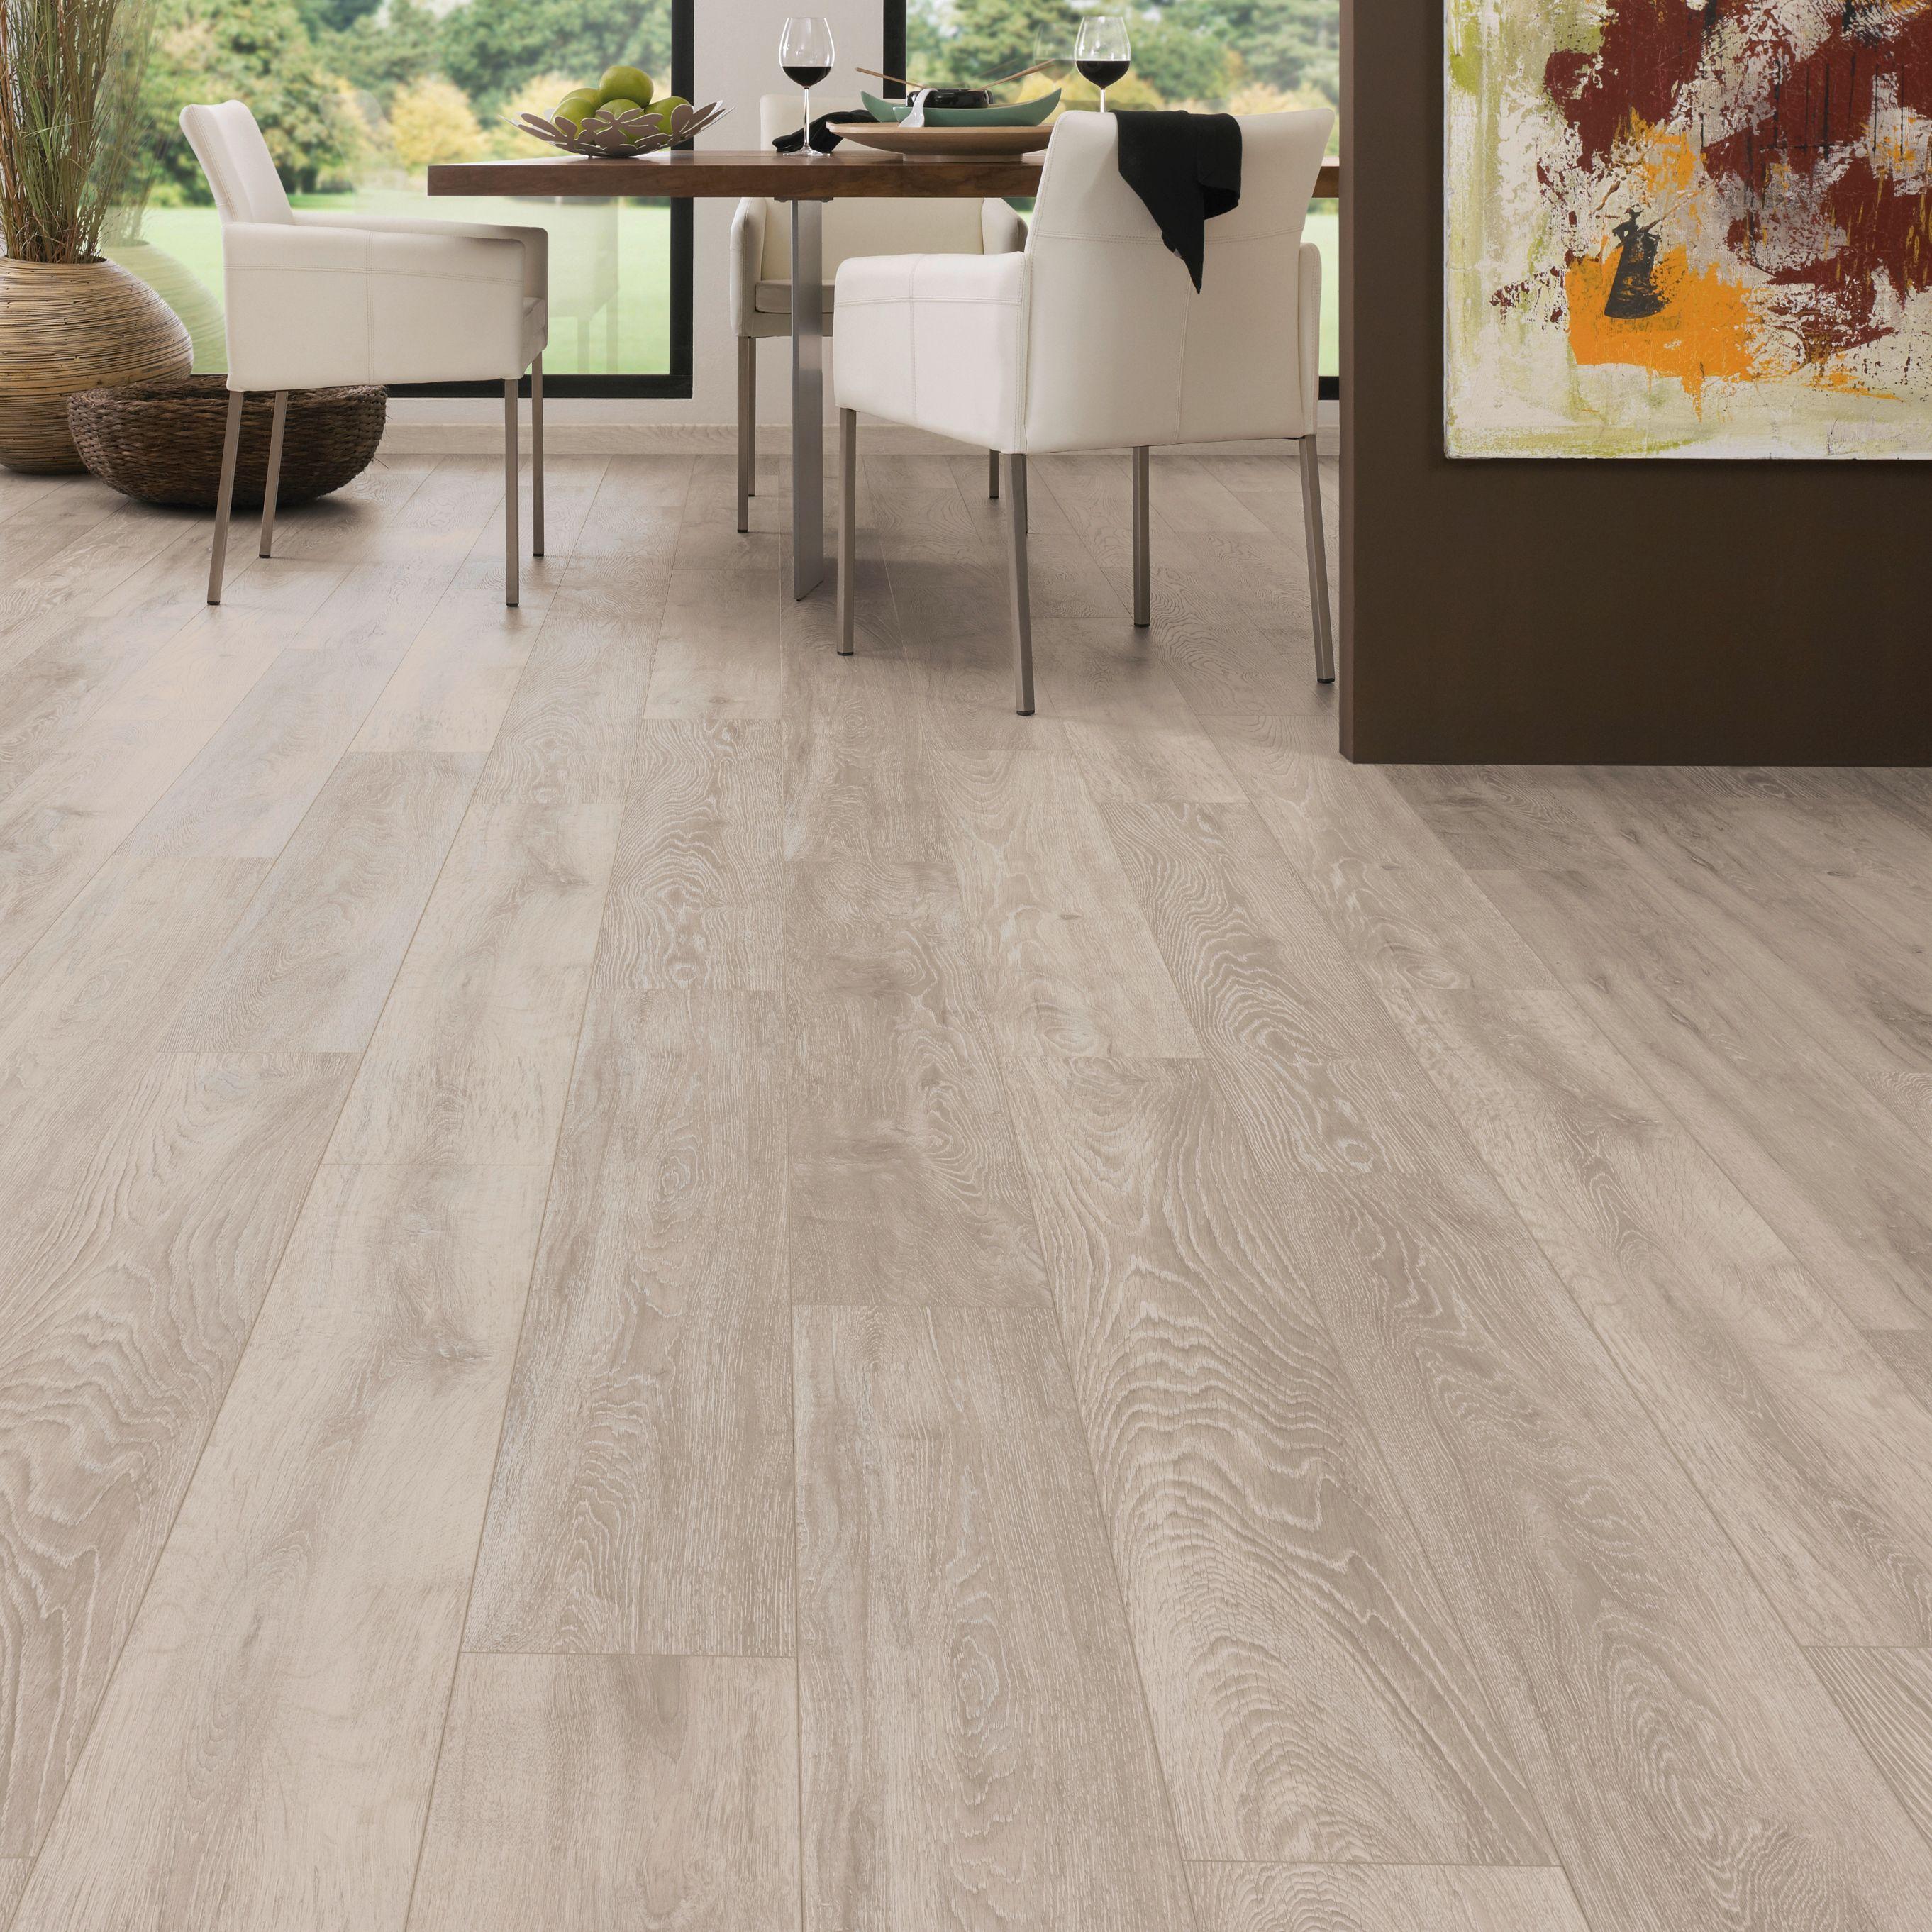 Natural Oak Effect Laminate Flooring Part - 43: Amadeo Boulder Embossed Laminate Flooring 2.22 M² Pack